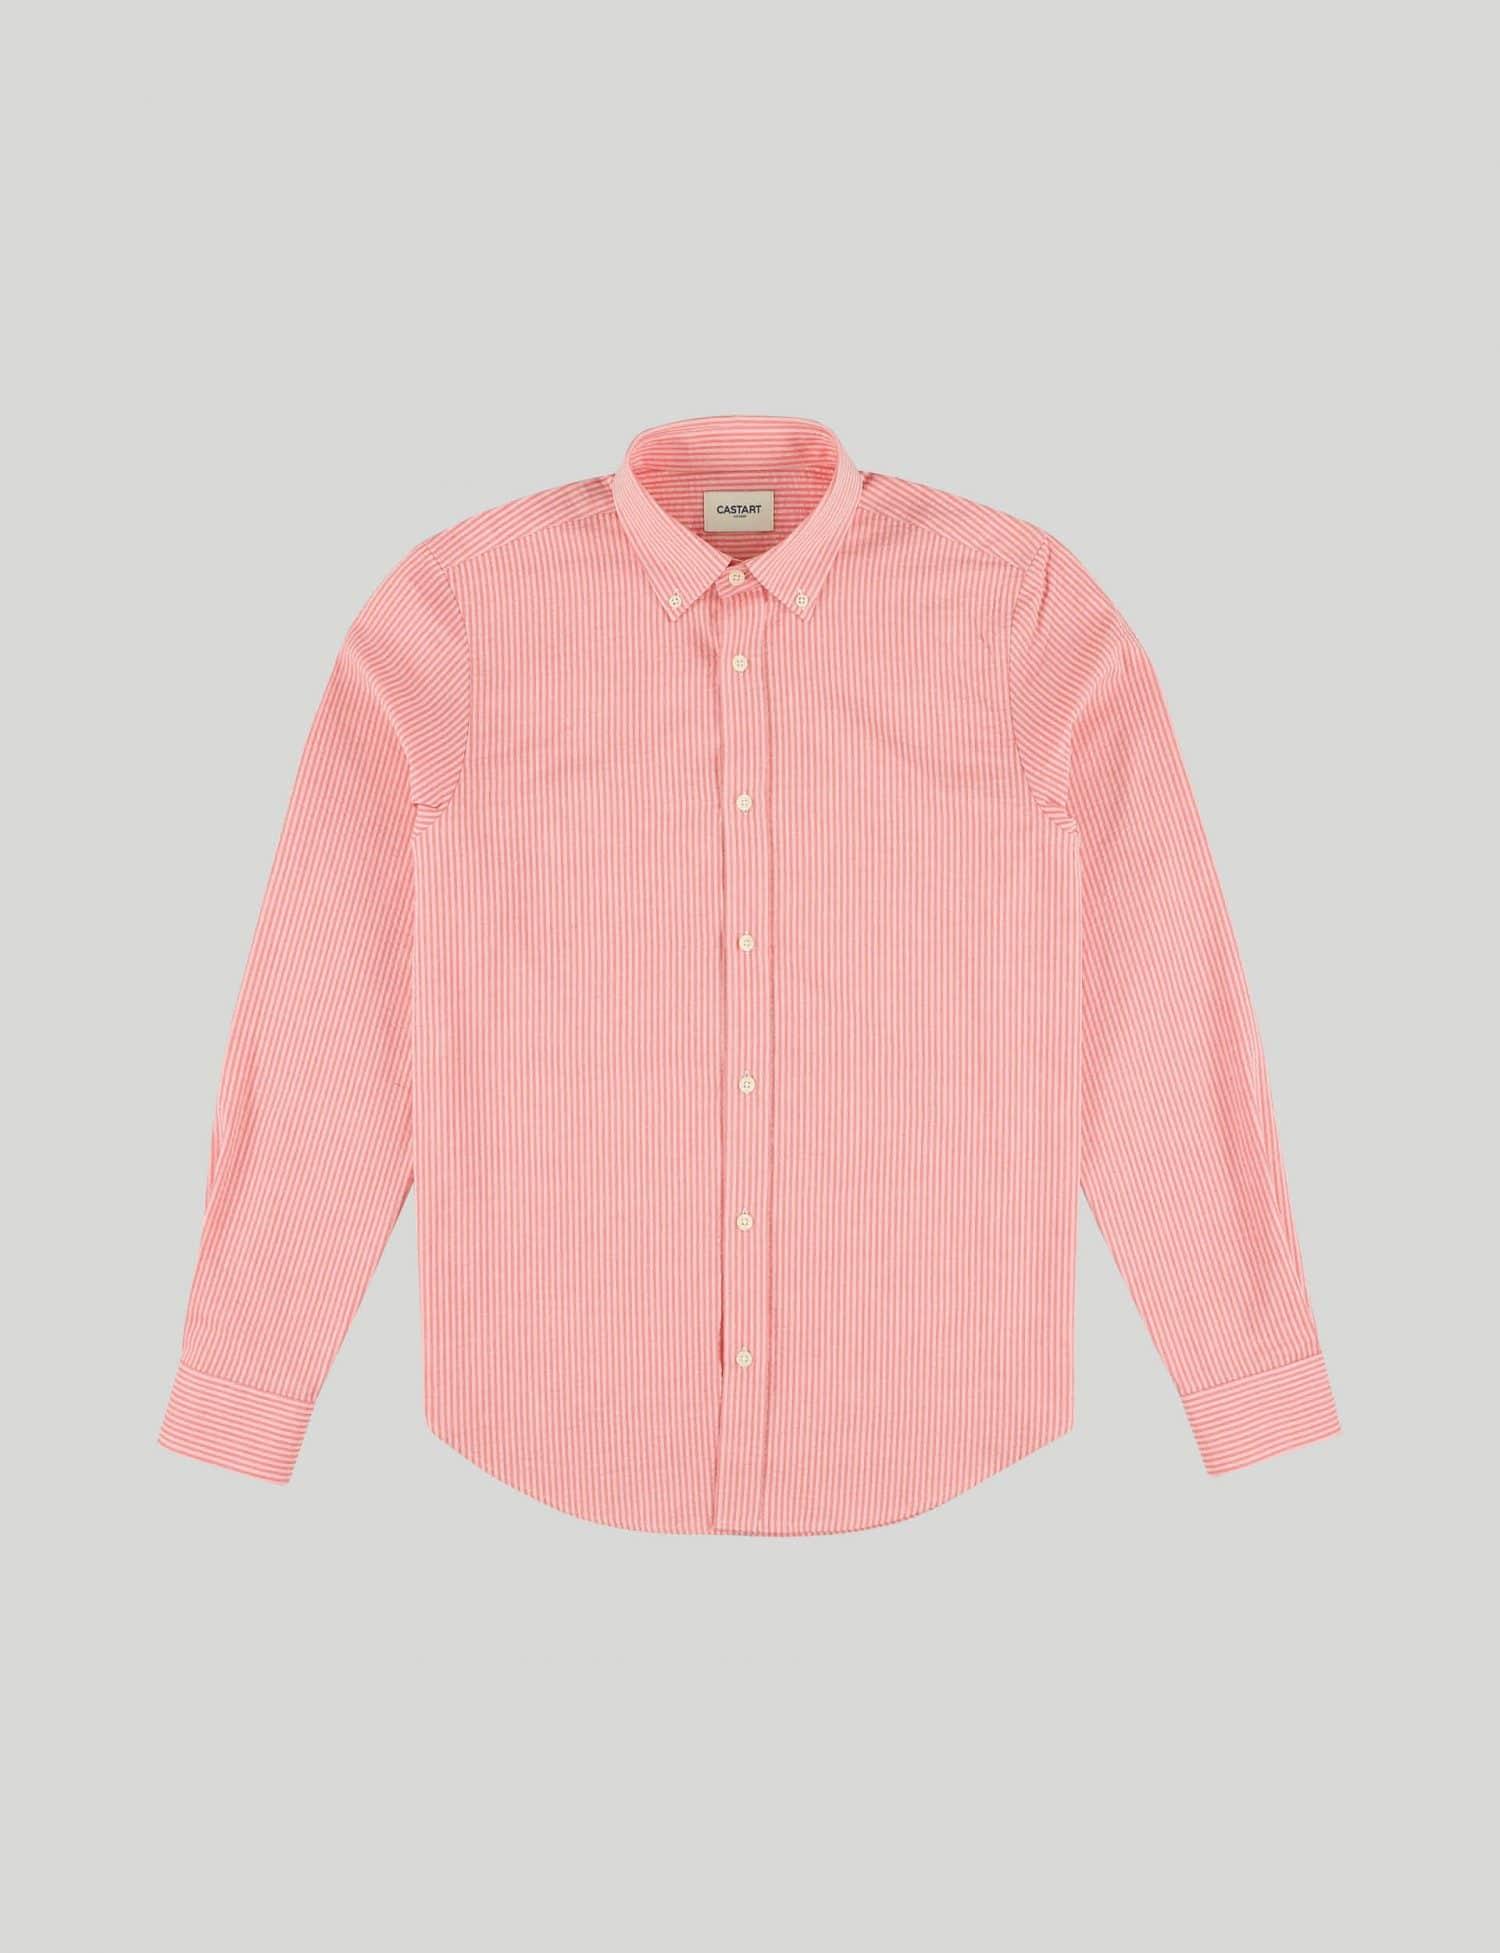 Castart - Burro's Tail Shirt - Salmon